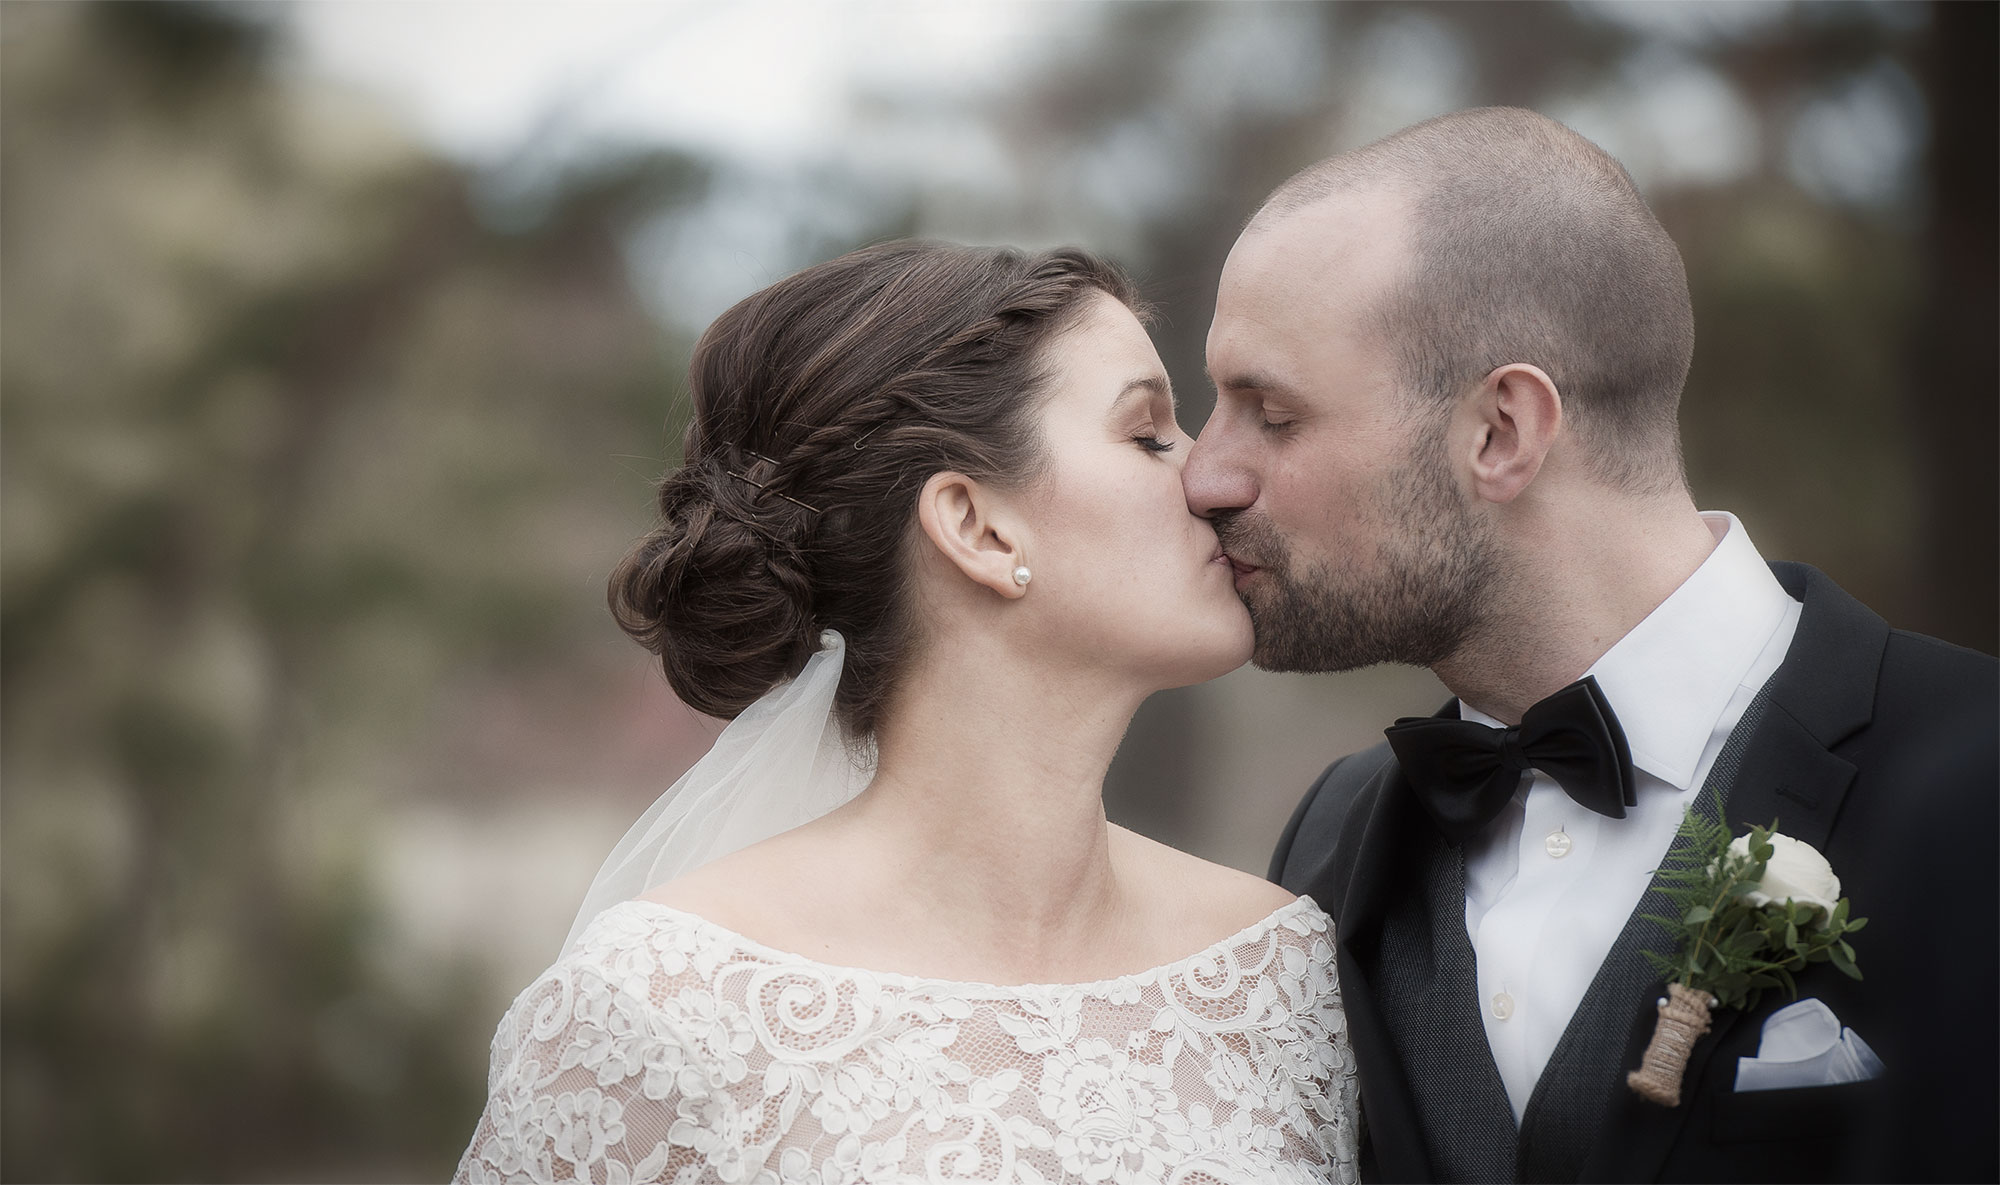 edsand-2-Emil-och-Maria-kyss-blek